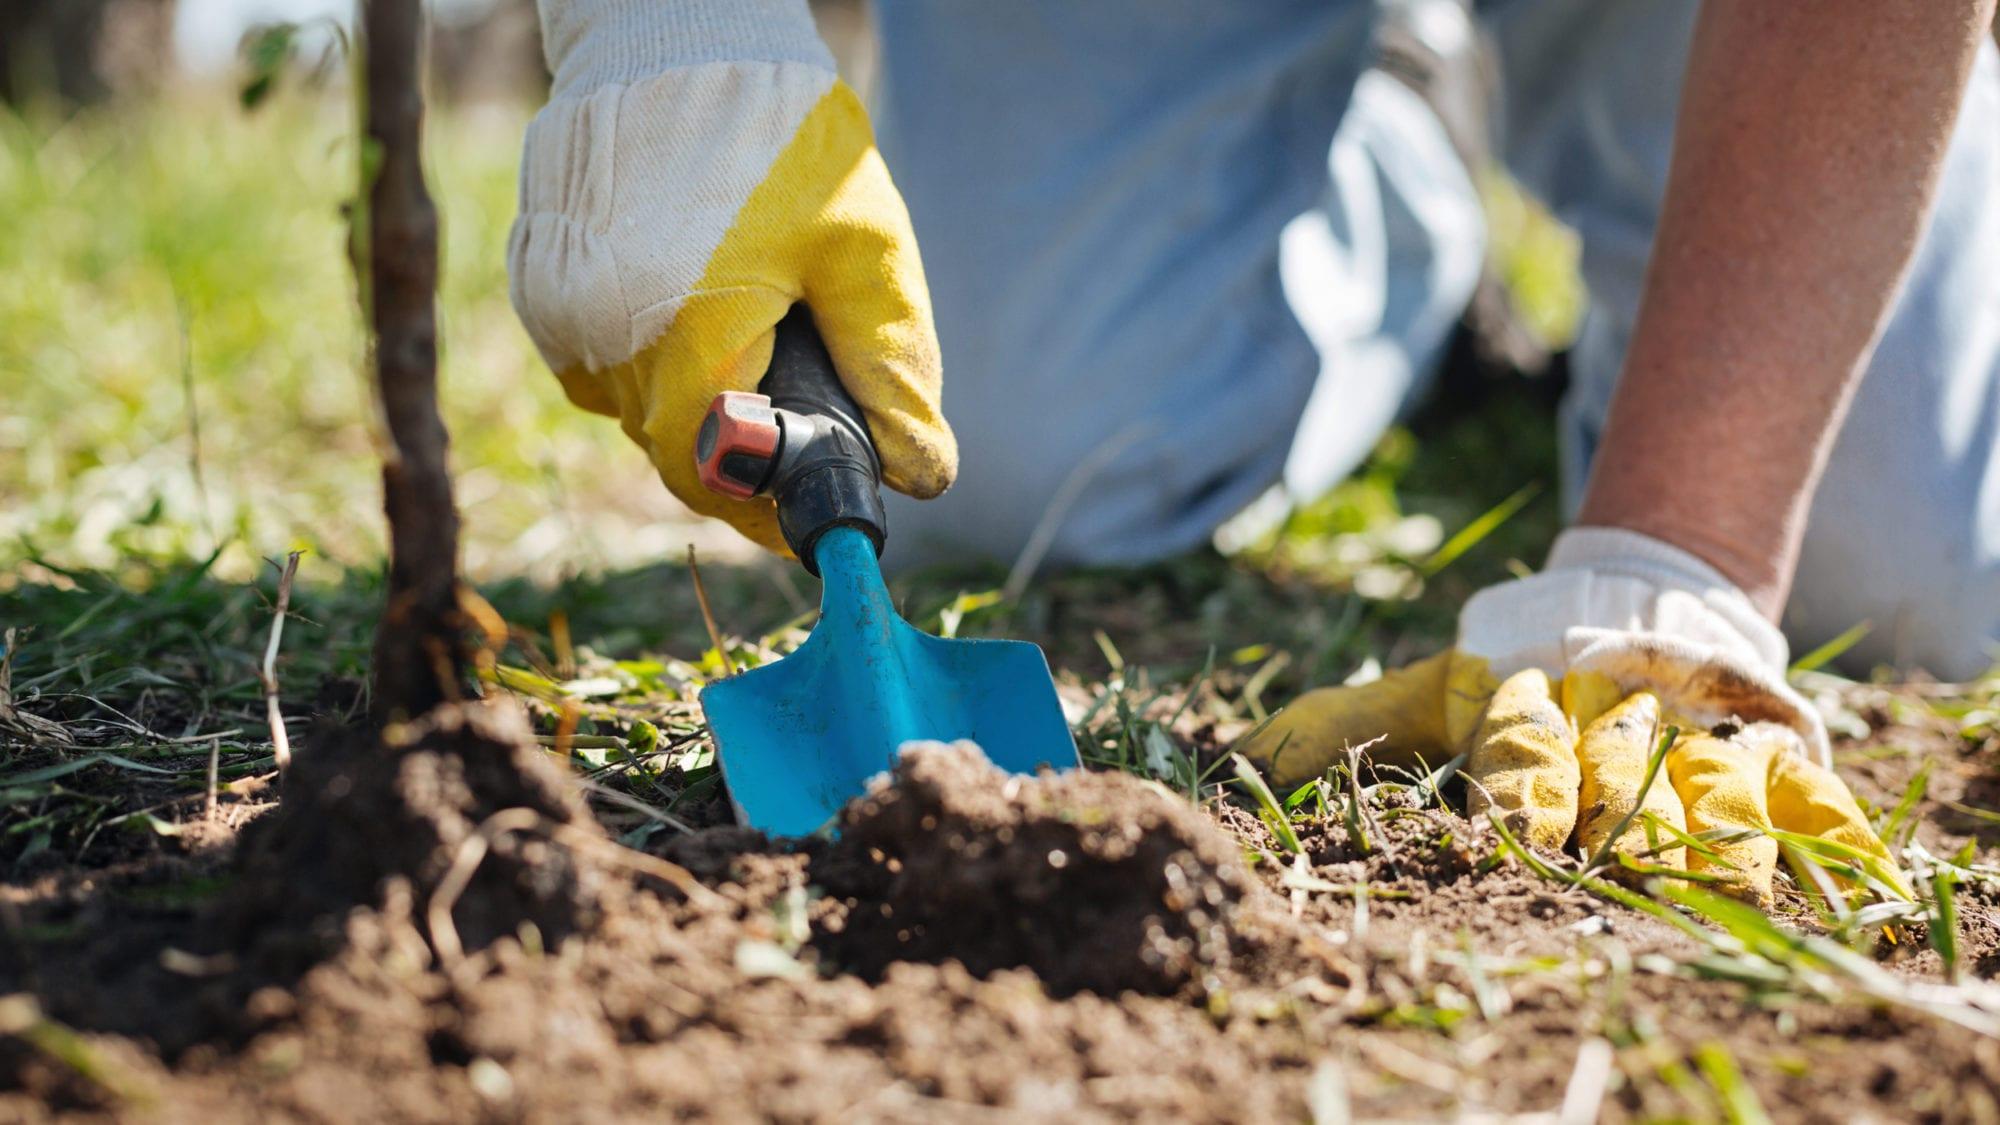 Gardener using spade in dirt.